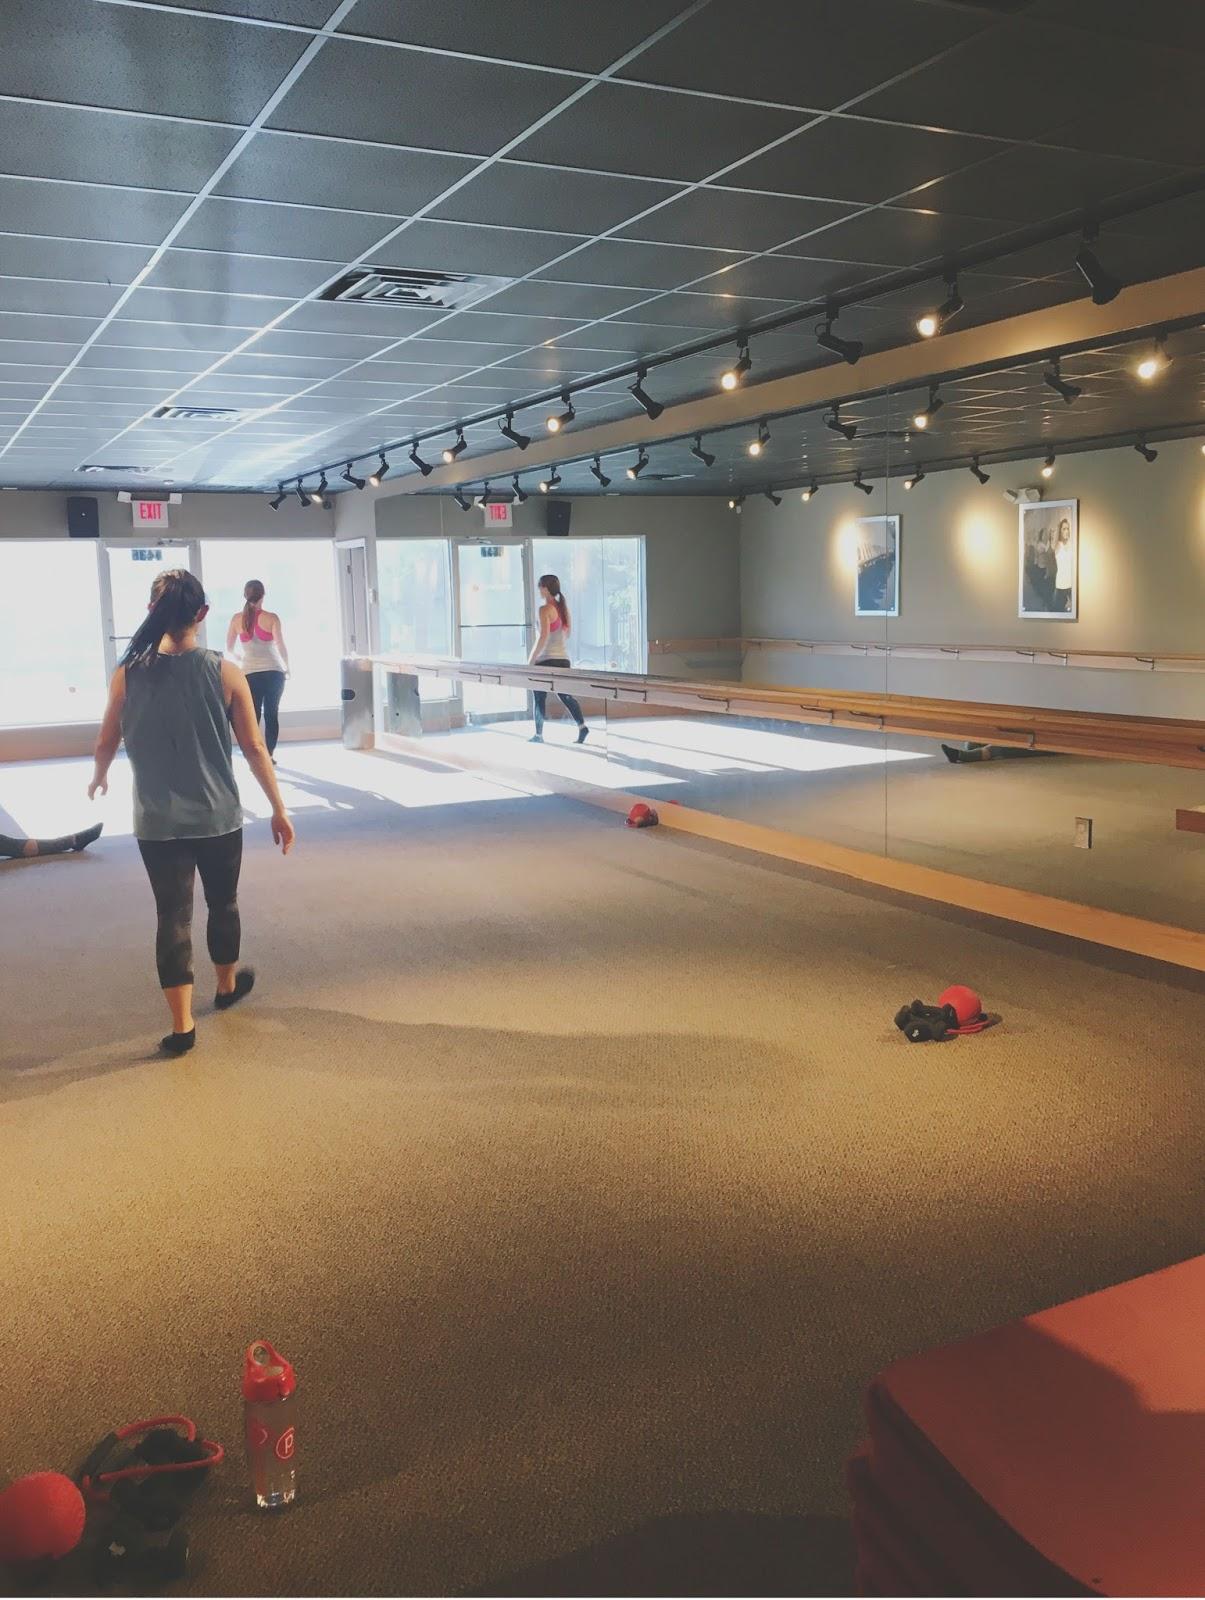 Pure Barre - A fitness studio in Houston, Texas